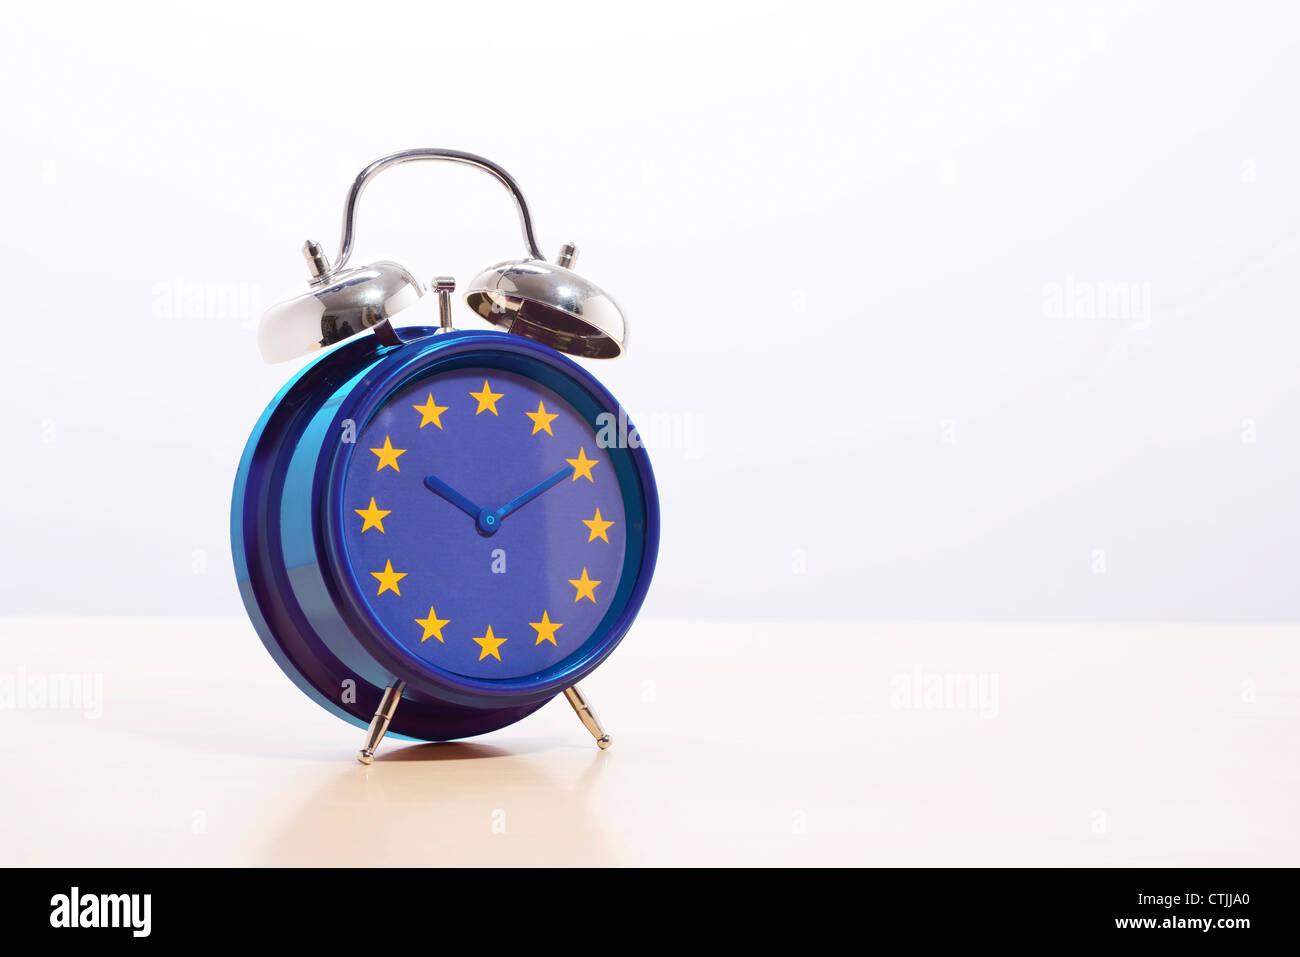 EU Europe flag on an alarm clock - Stock Image